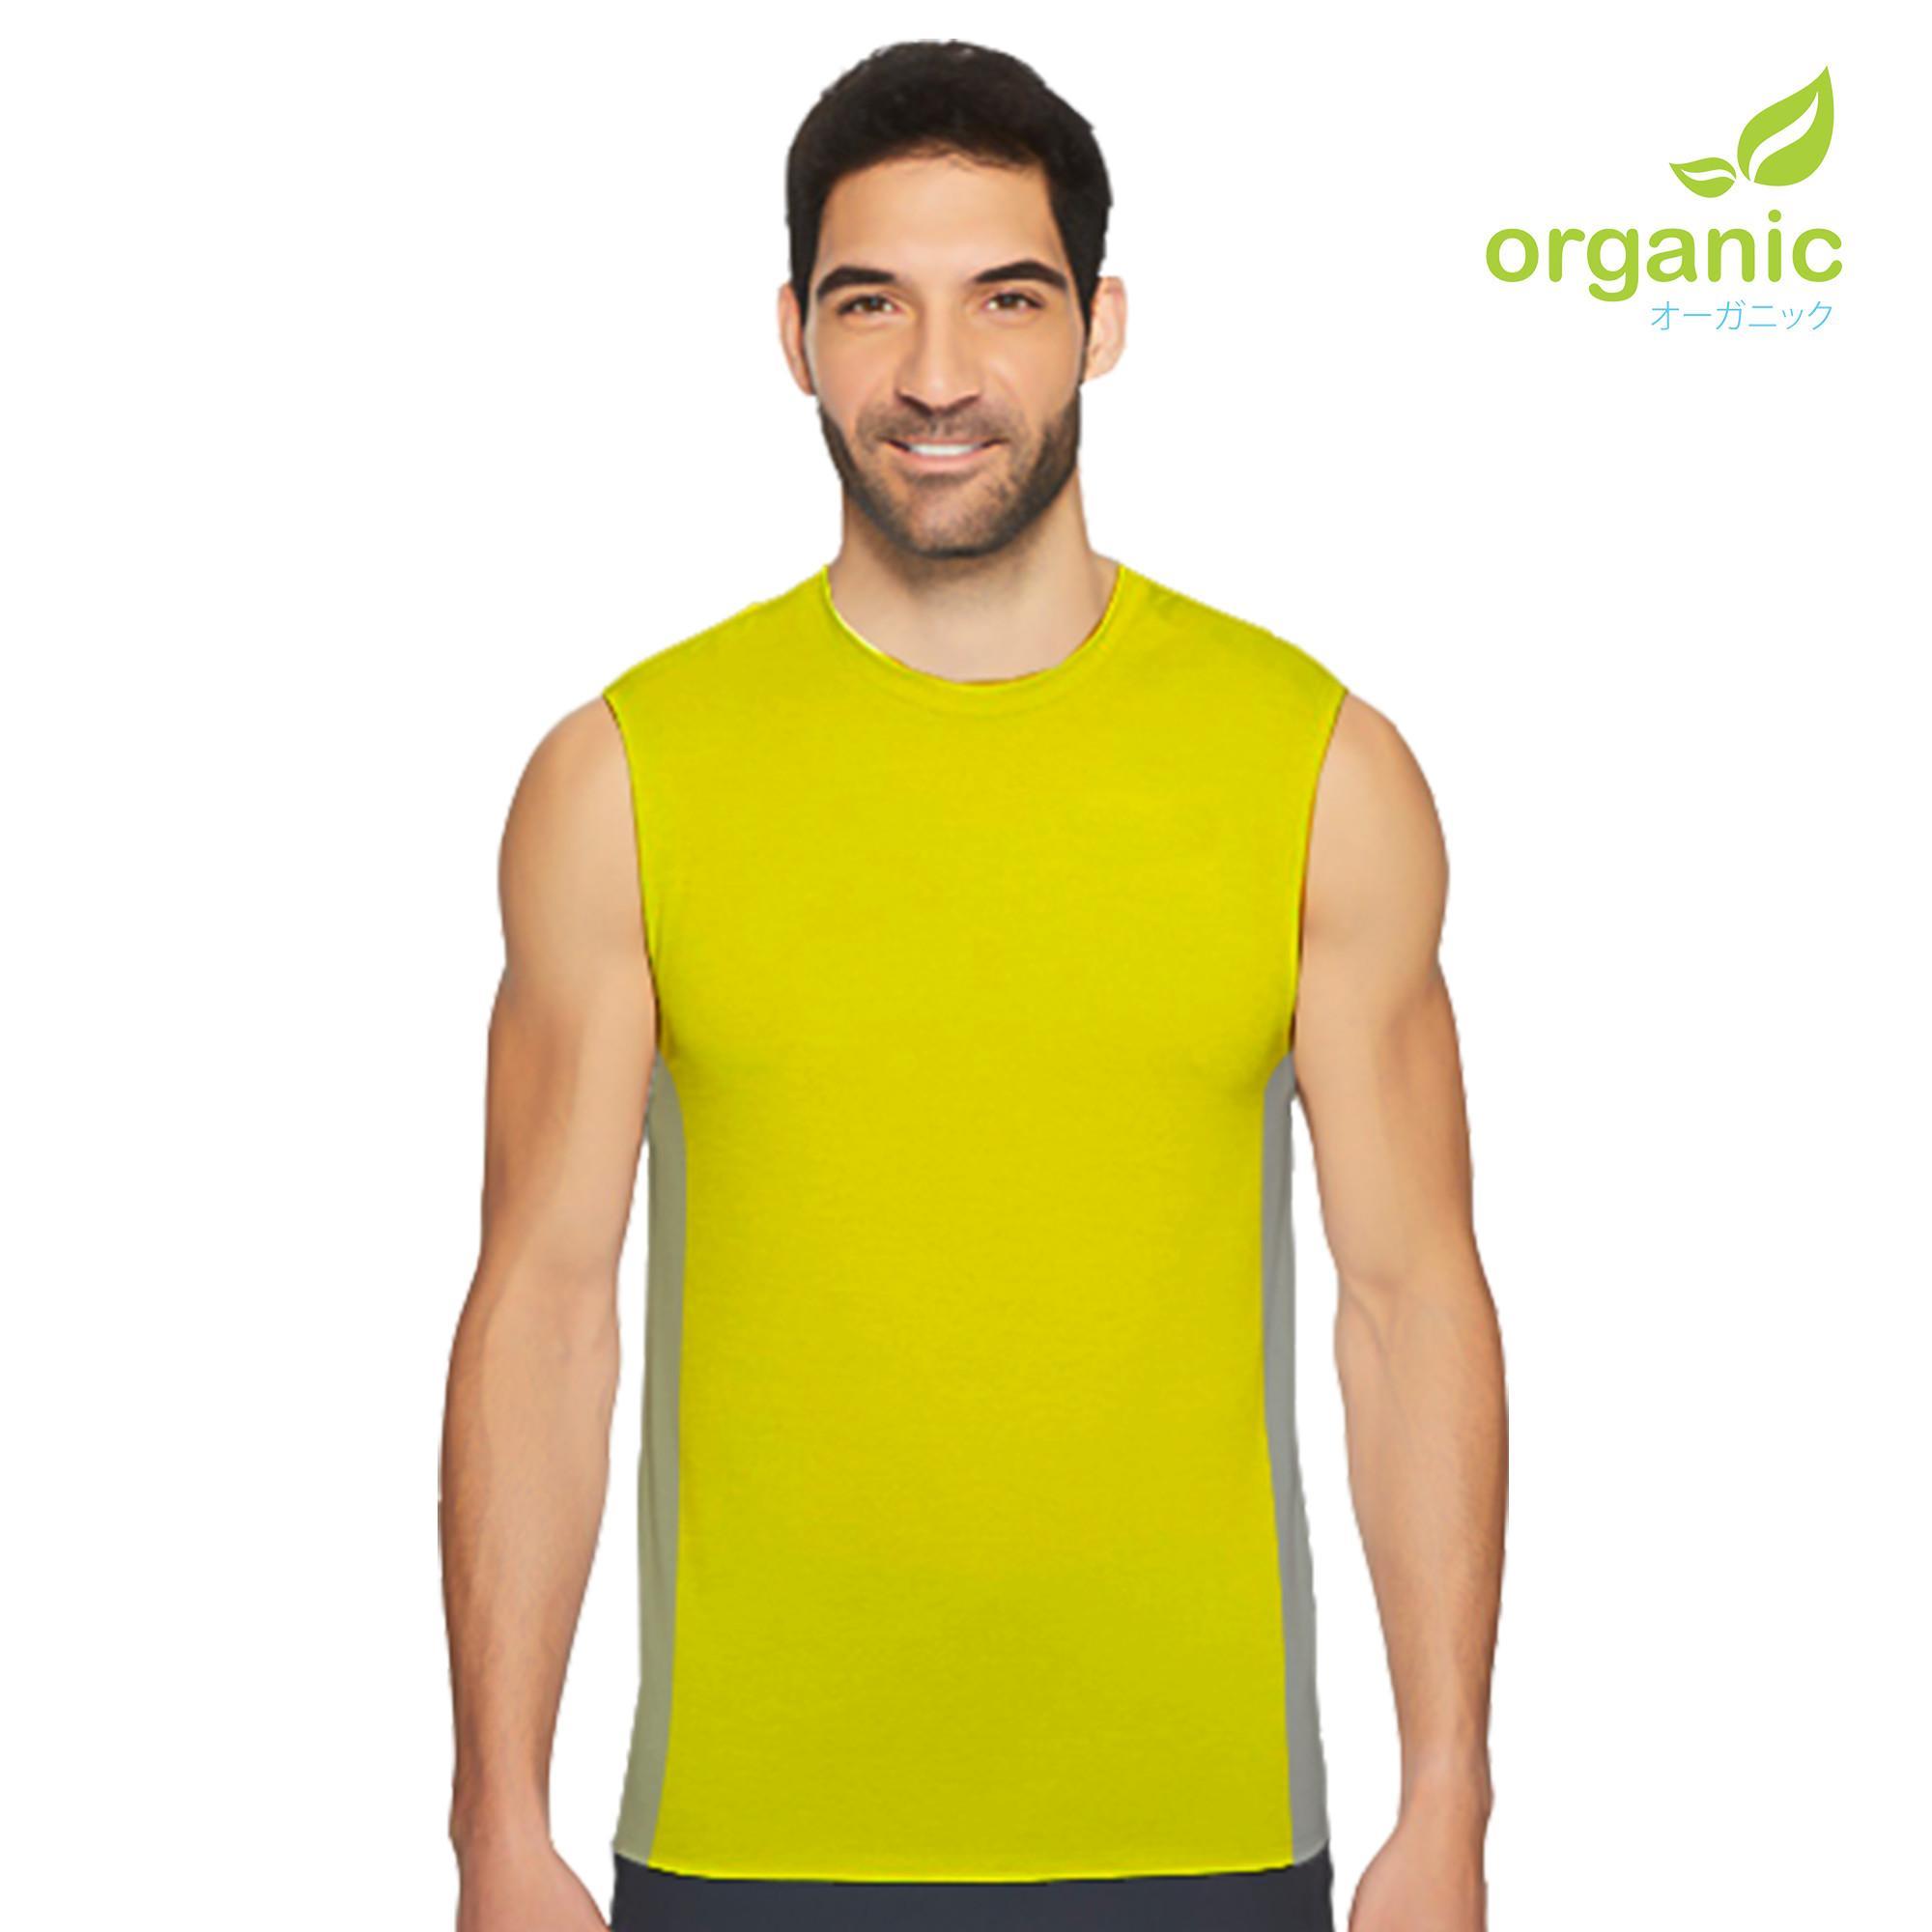 db75a7ca1f6 Sell men tshirt t cheapest best quality